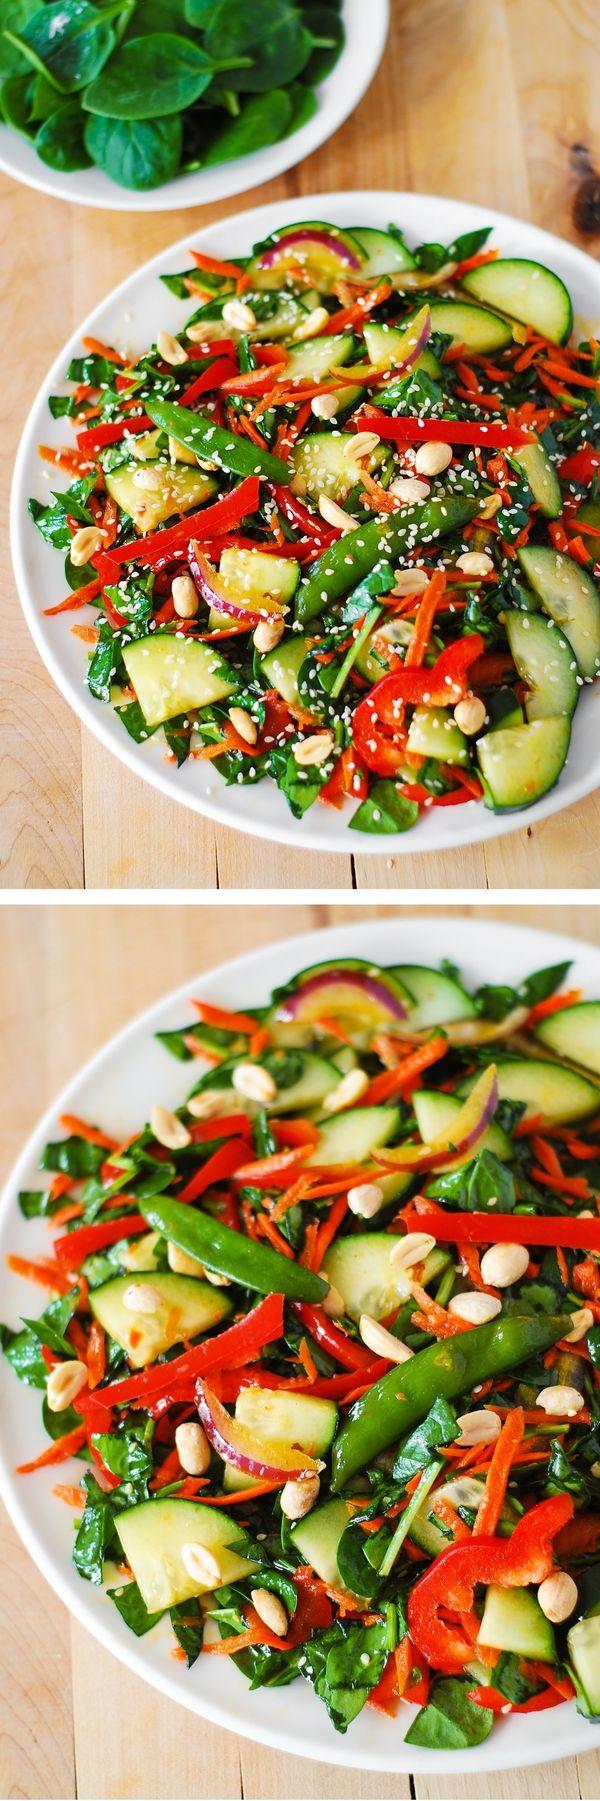 Crunchy Asian salad with peanut dressing